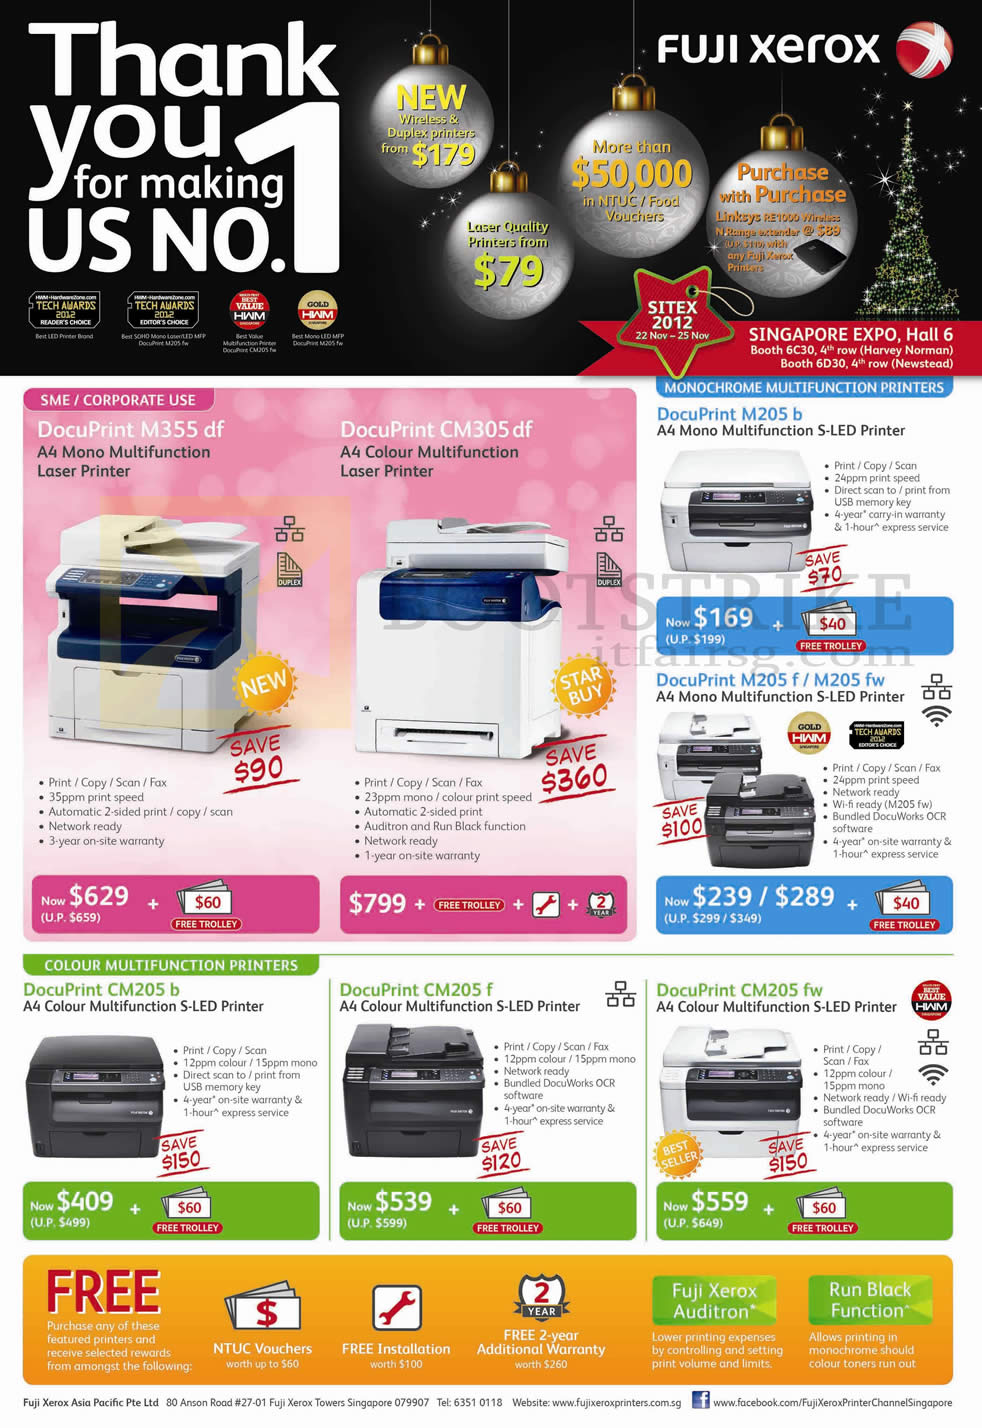 Fuji Xerox Laser Printers DocuPrint M355 Df, CM305 Df, M205